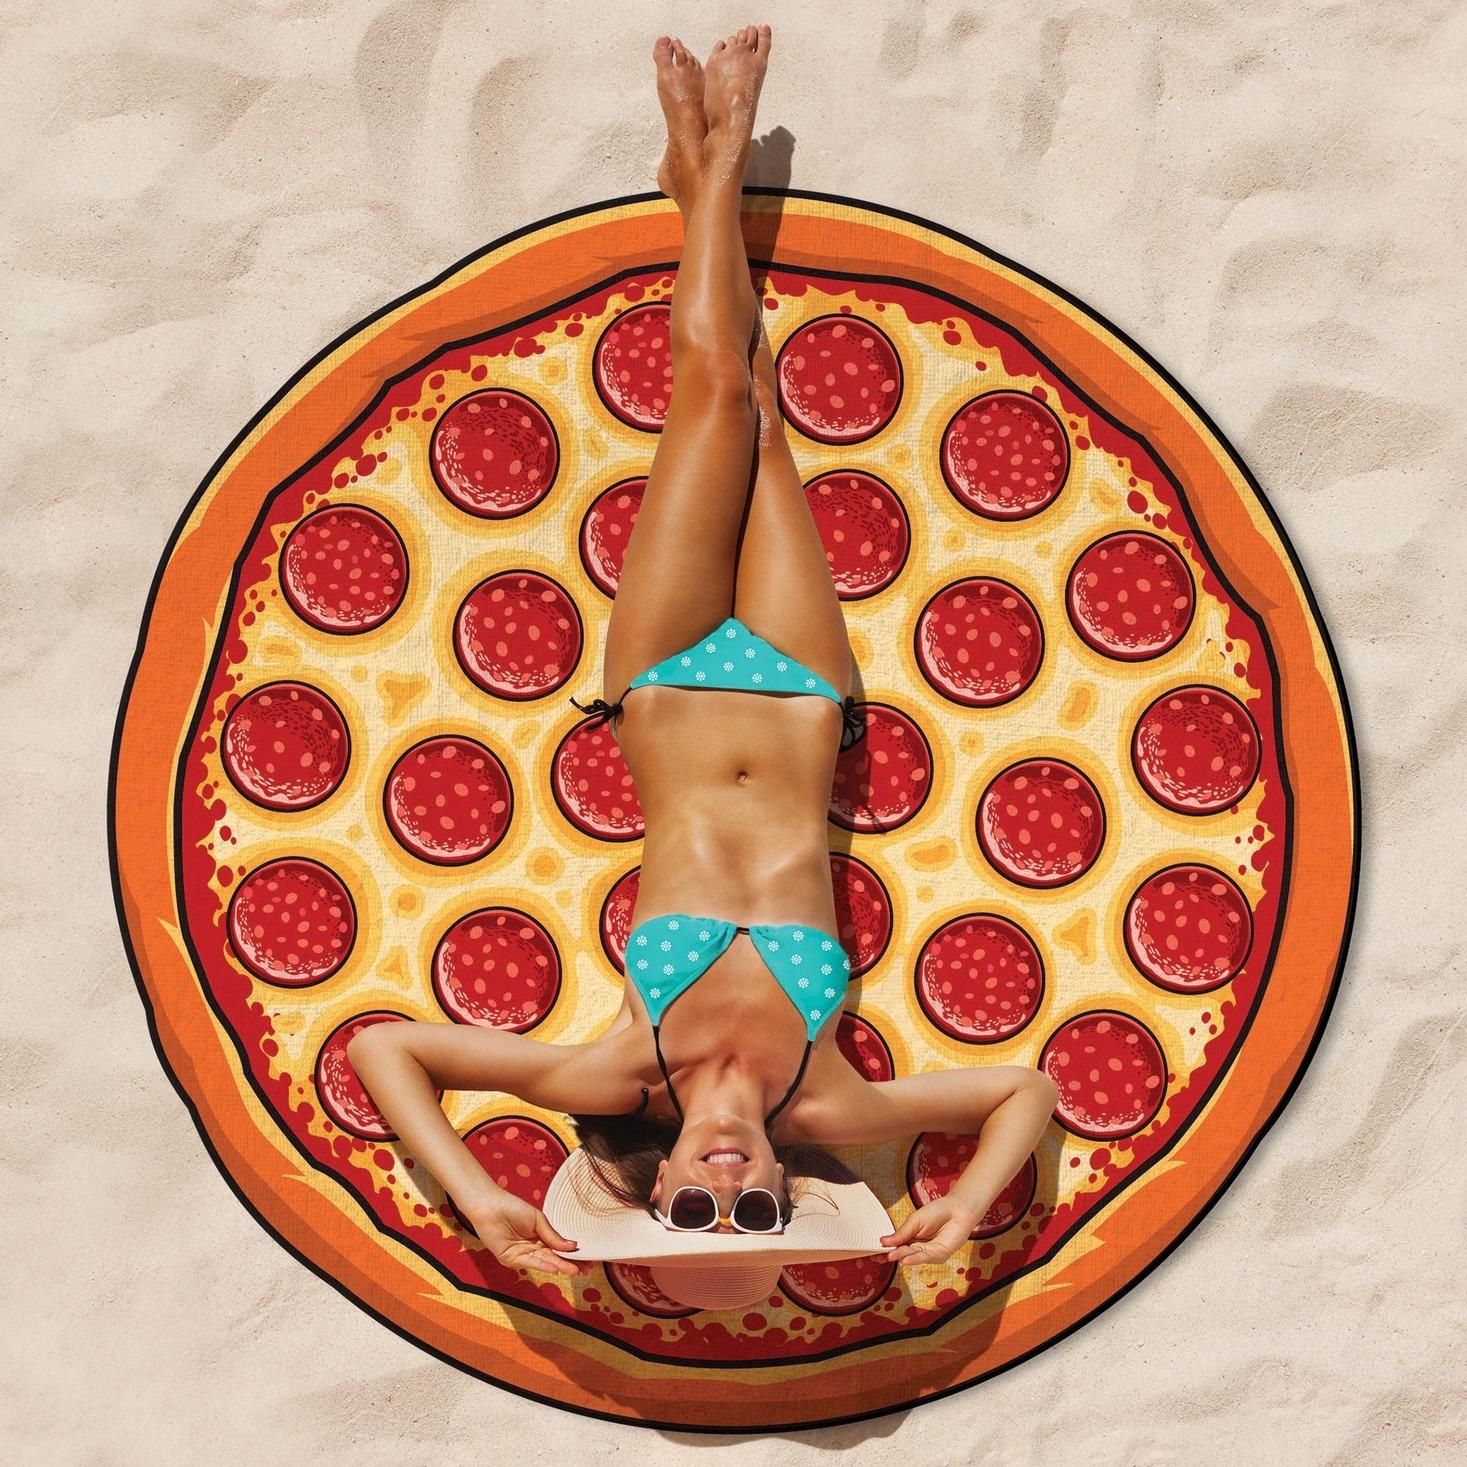 Gigantic Pizza Towel image